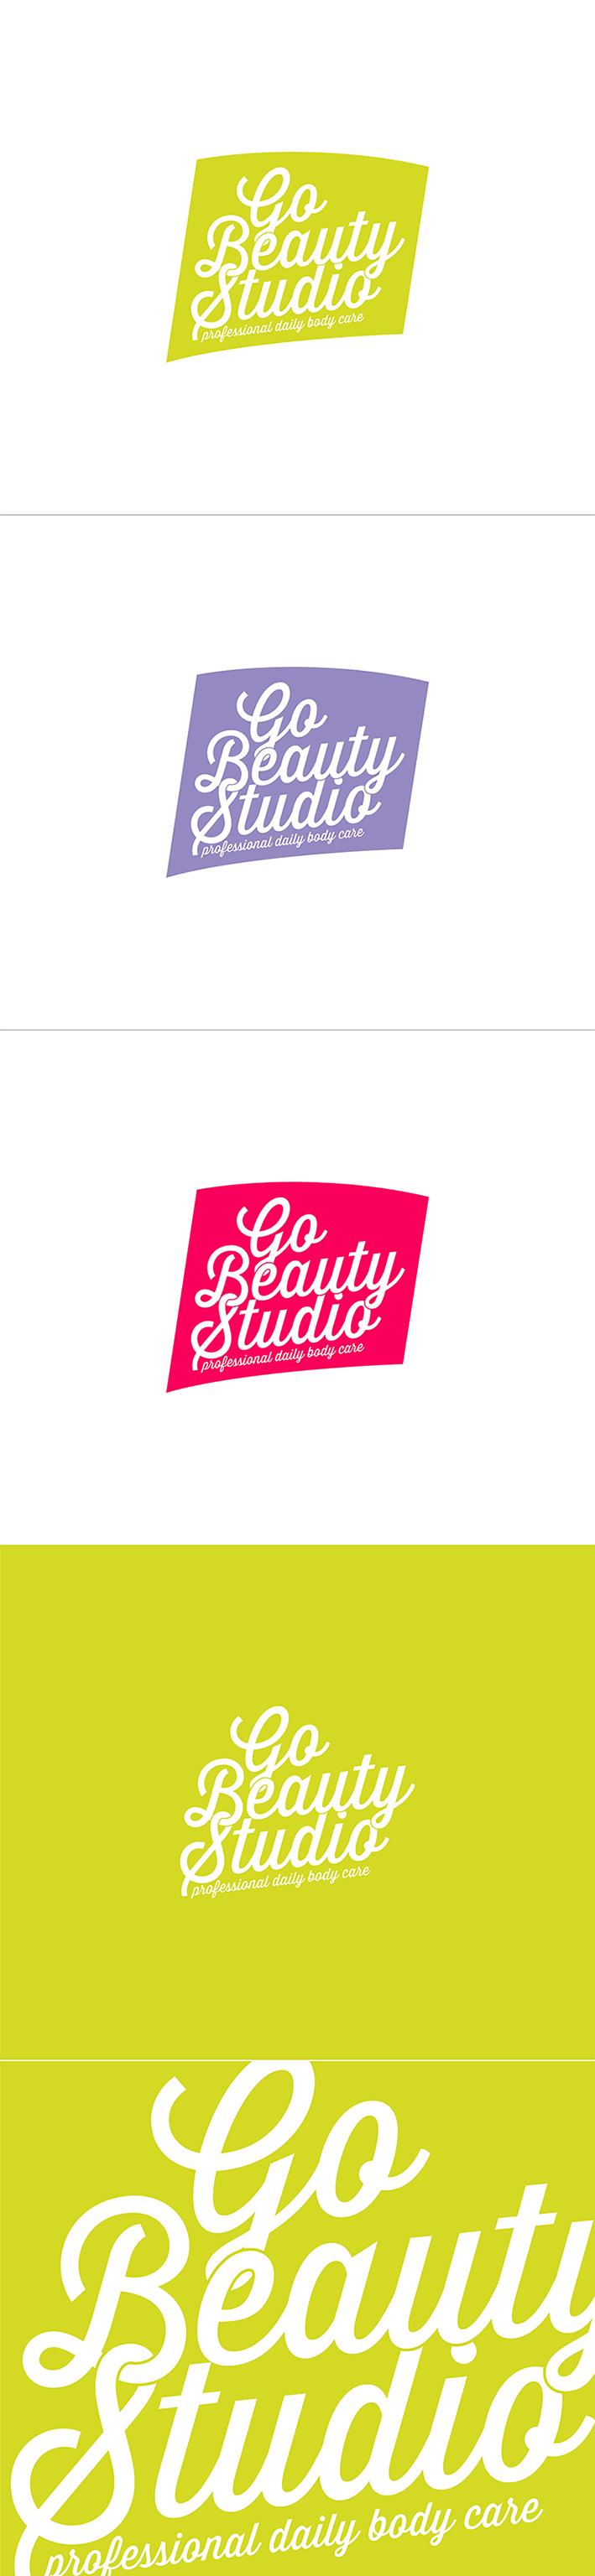 Go Beauty Studio